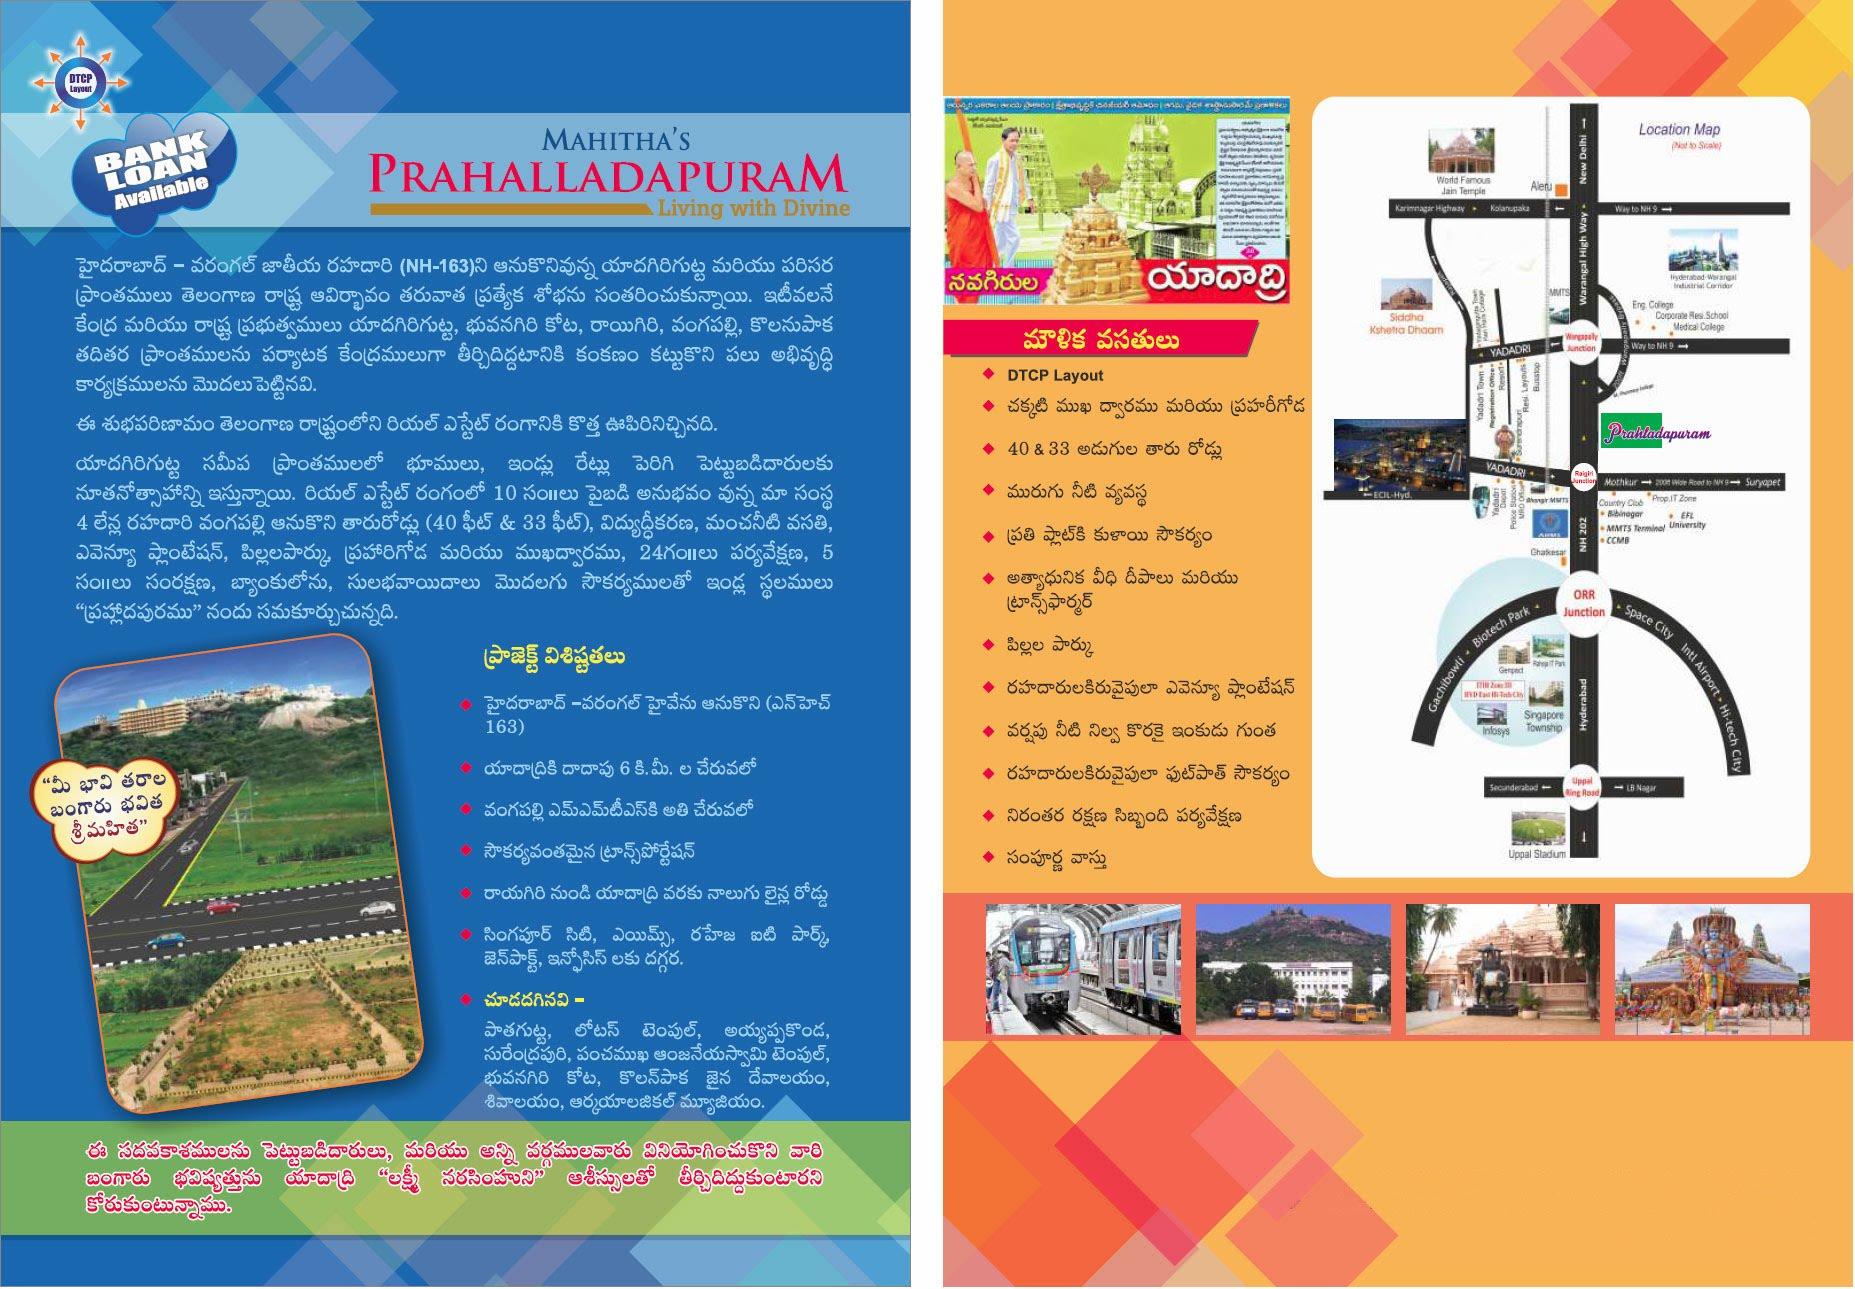 https://sites.google.com/a/egway.co.in/realestate/plots-in-hyderabad/mahitas-prahladapuram-wangapalli-yadagirigutta-yadadri/brochure_telugu_prahladapuram.jpg